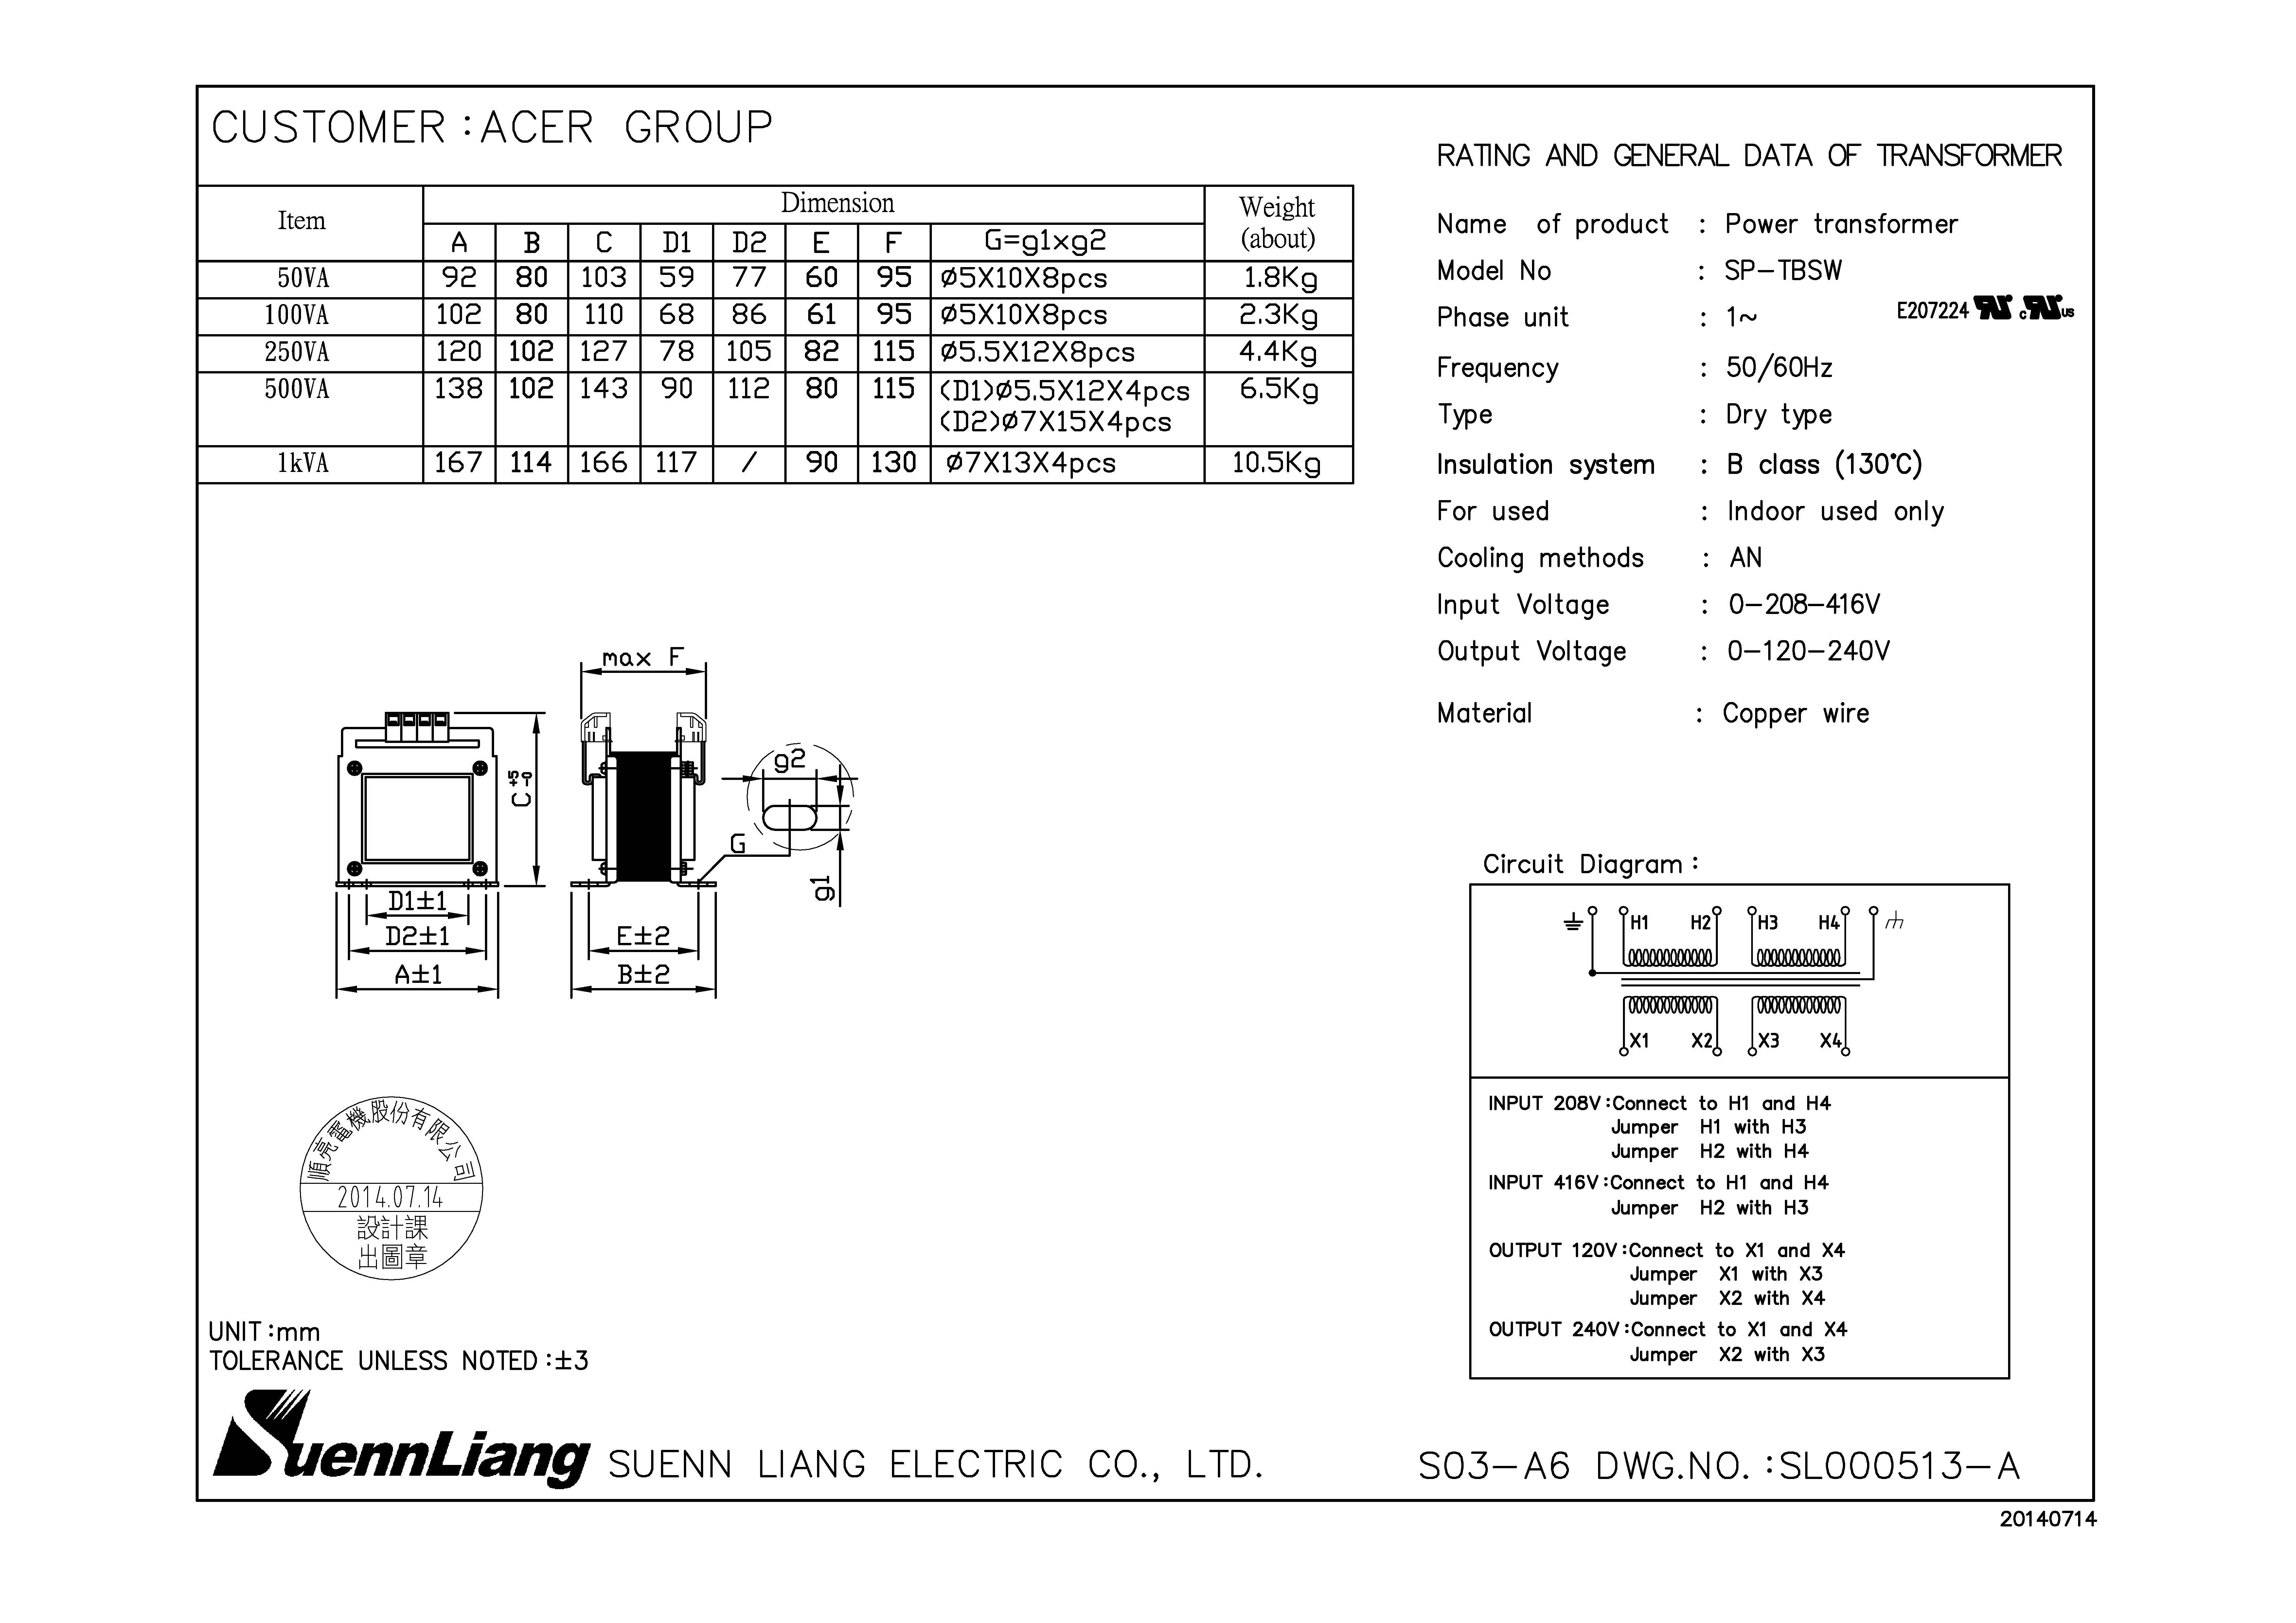 f11000 60 hz input  208  416v